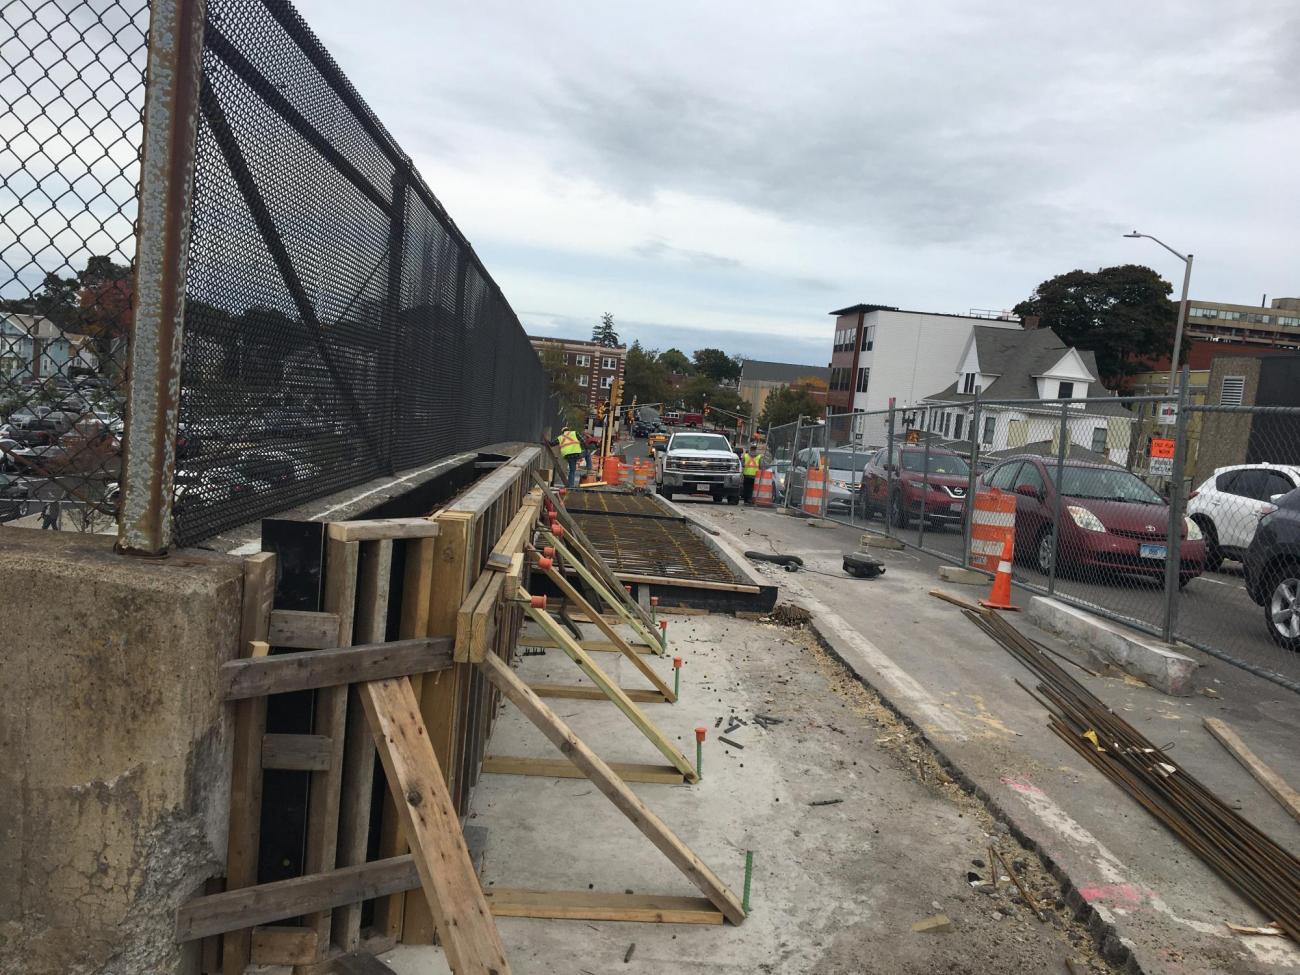 New sidewalk construction on Beale Street adjacent to Wollaston Station (October 2019)